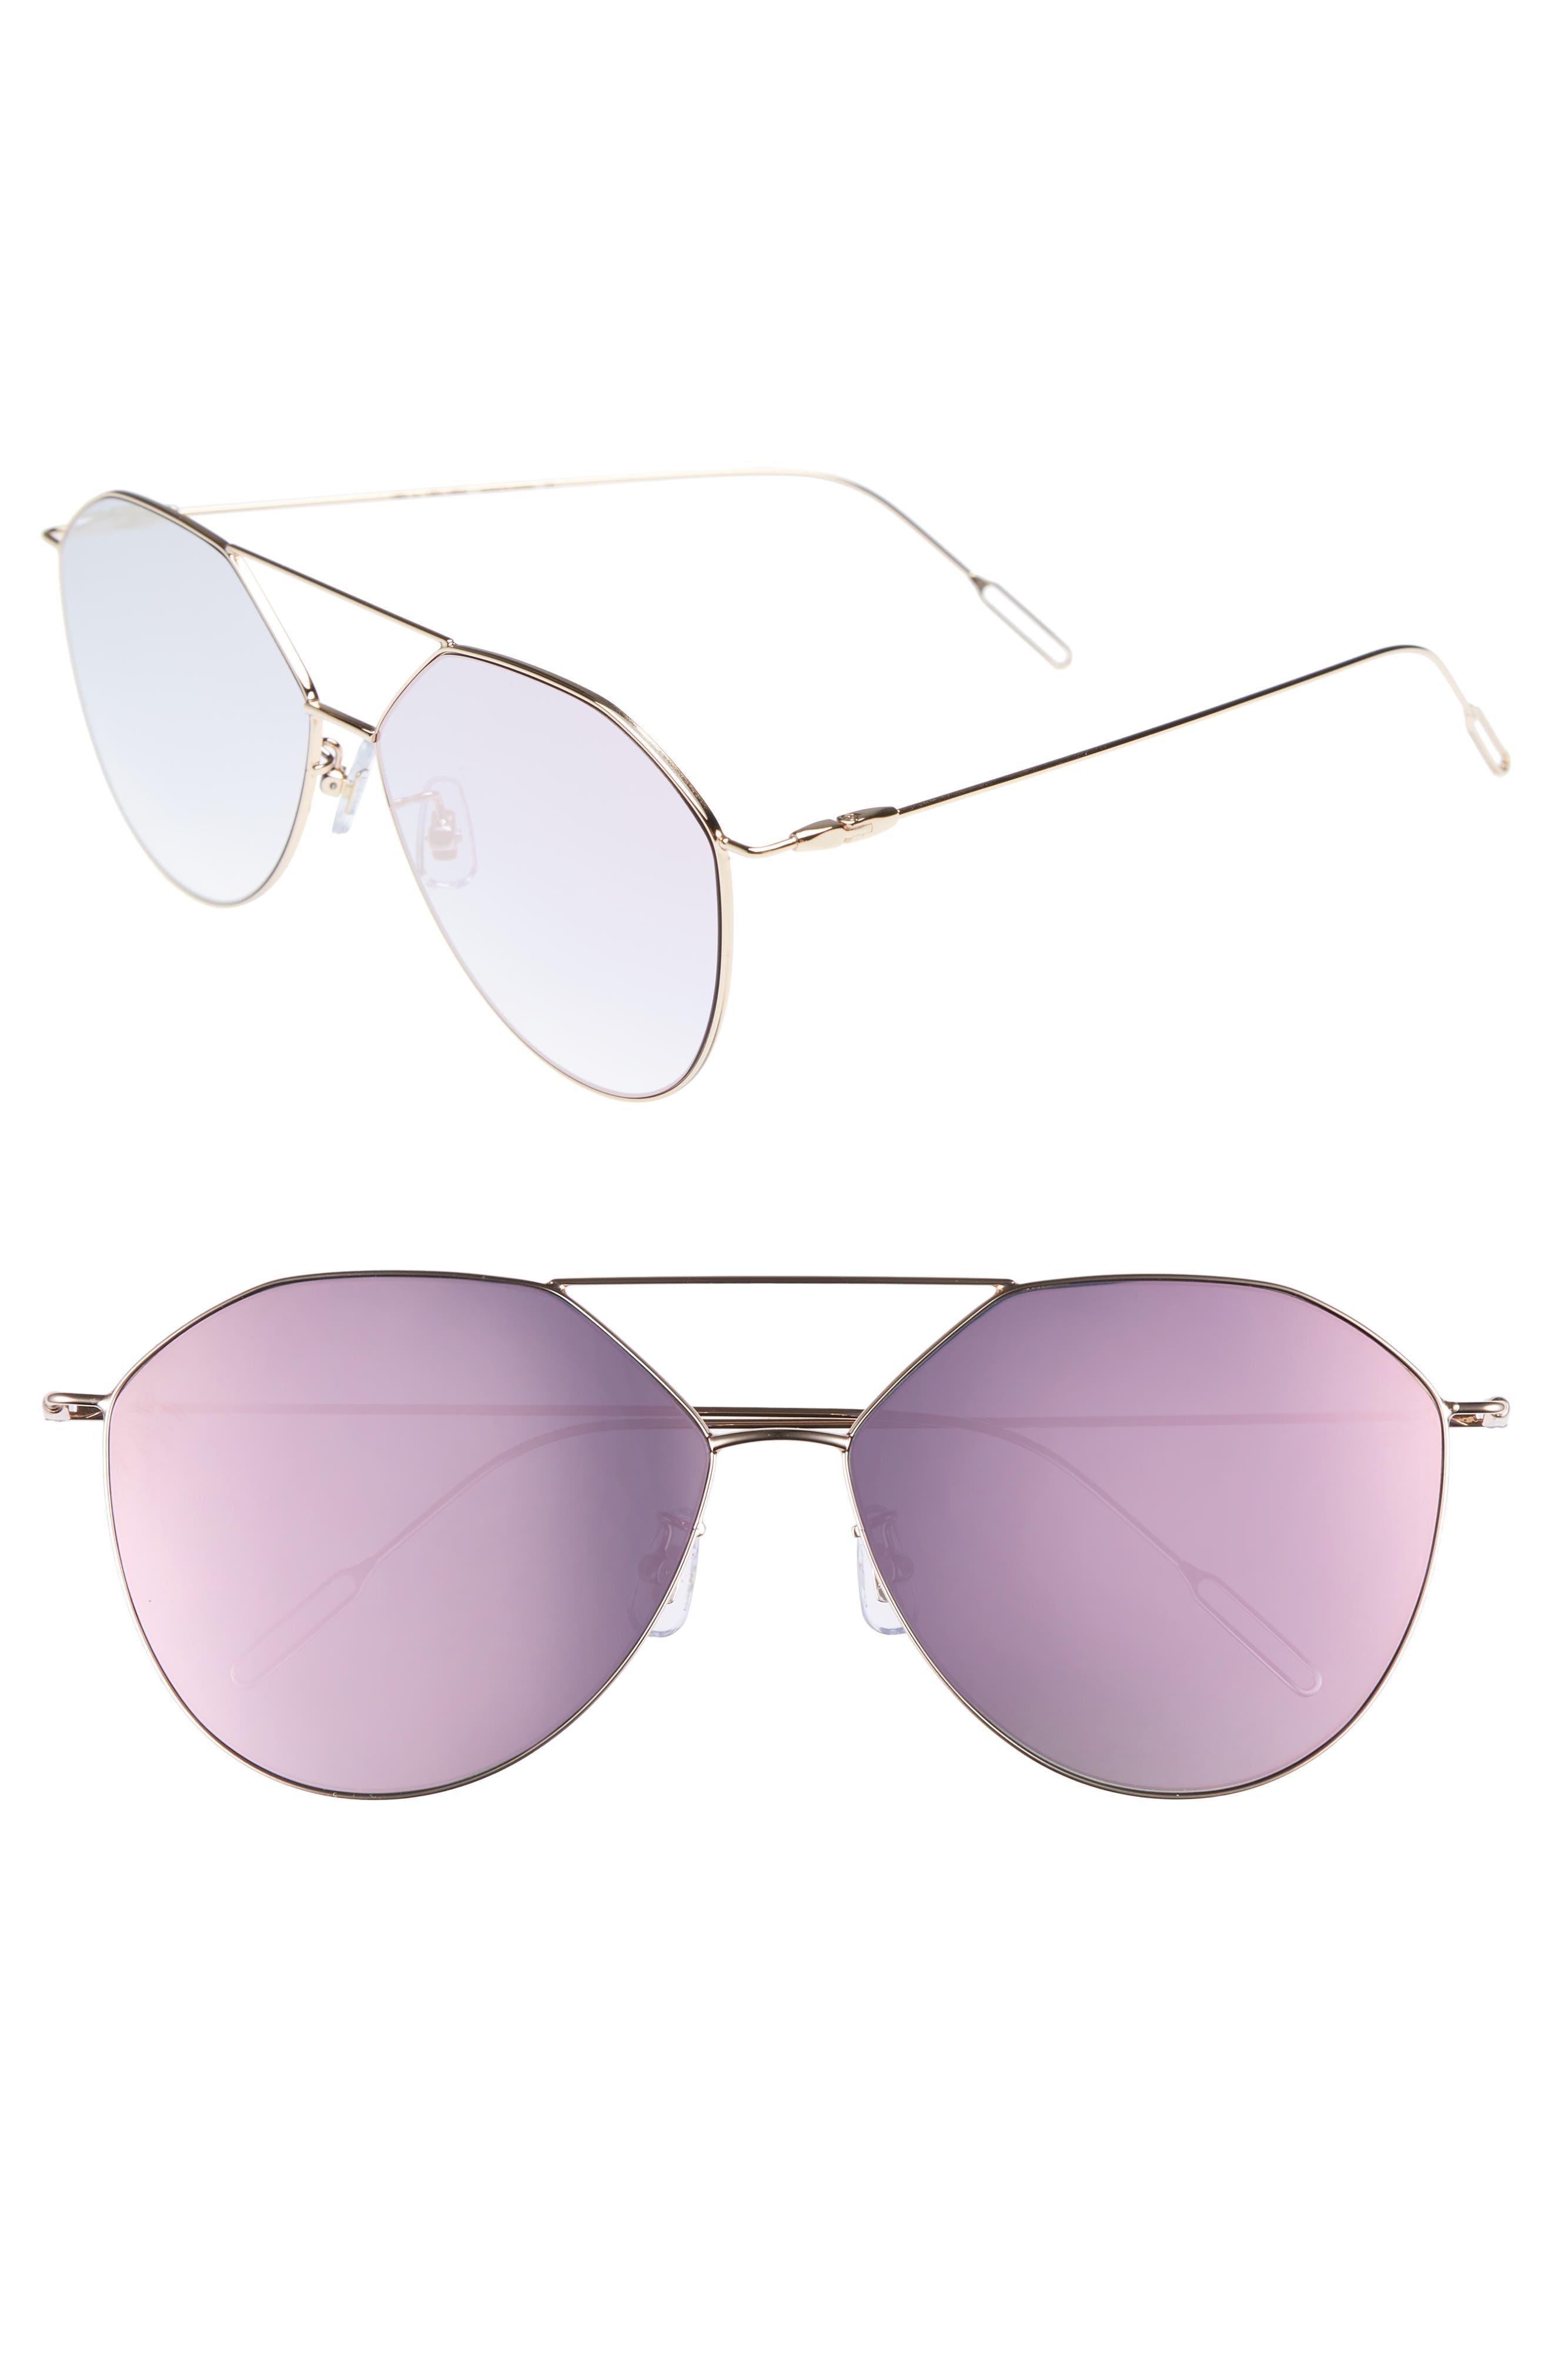 55mm Metal Aviator Sunglasses,                         Main,                         color, GOLD /PINK MIRROR